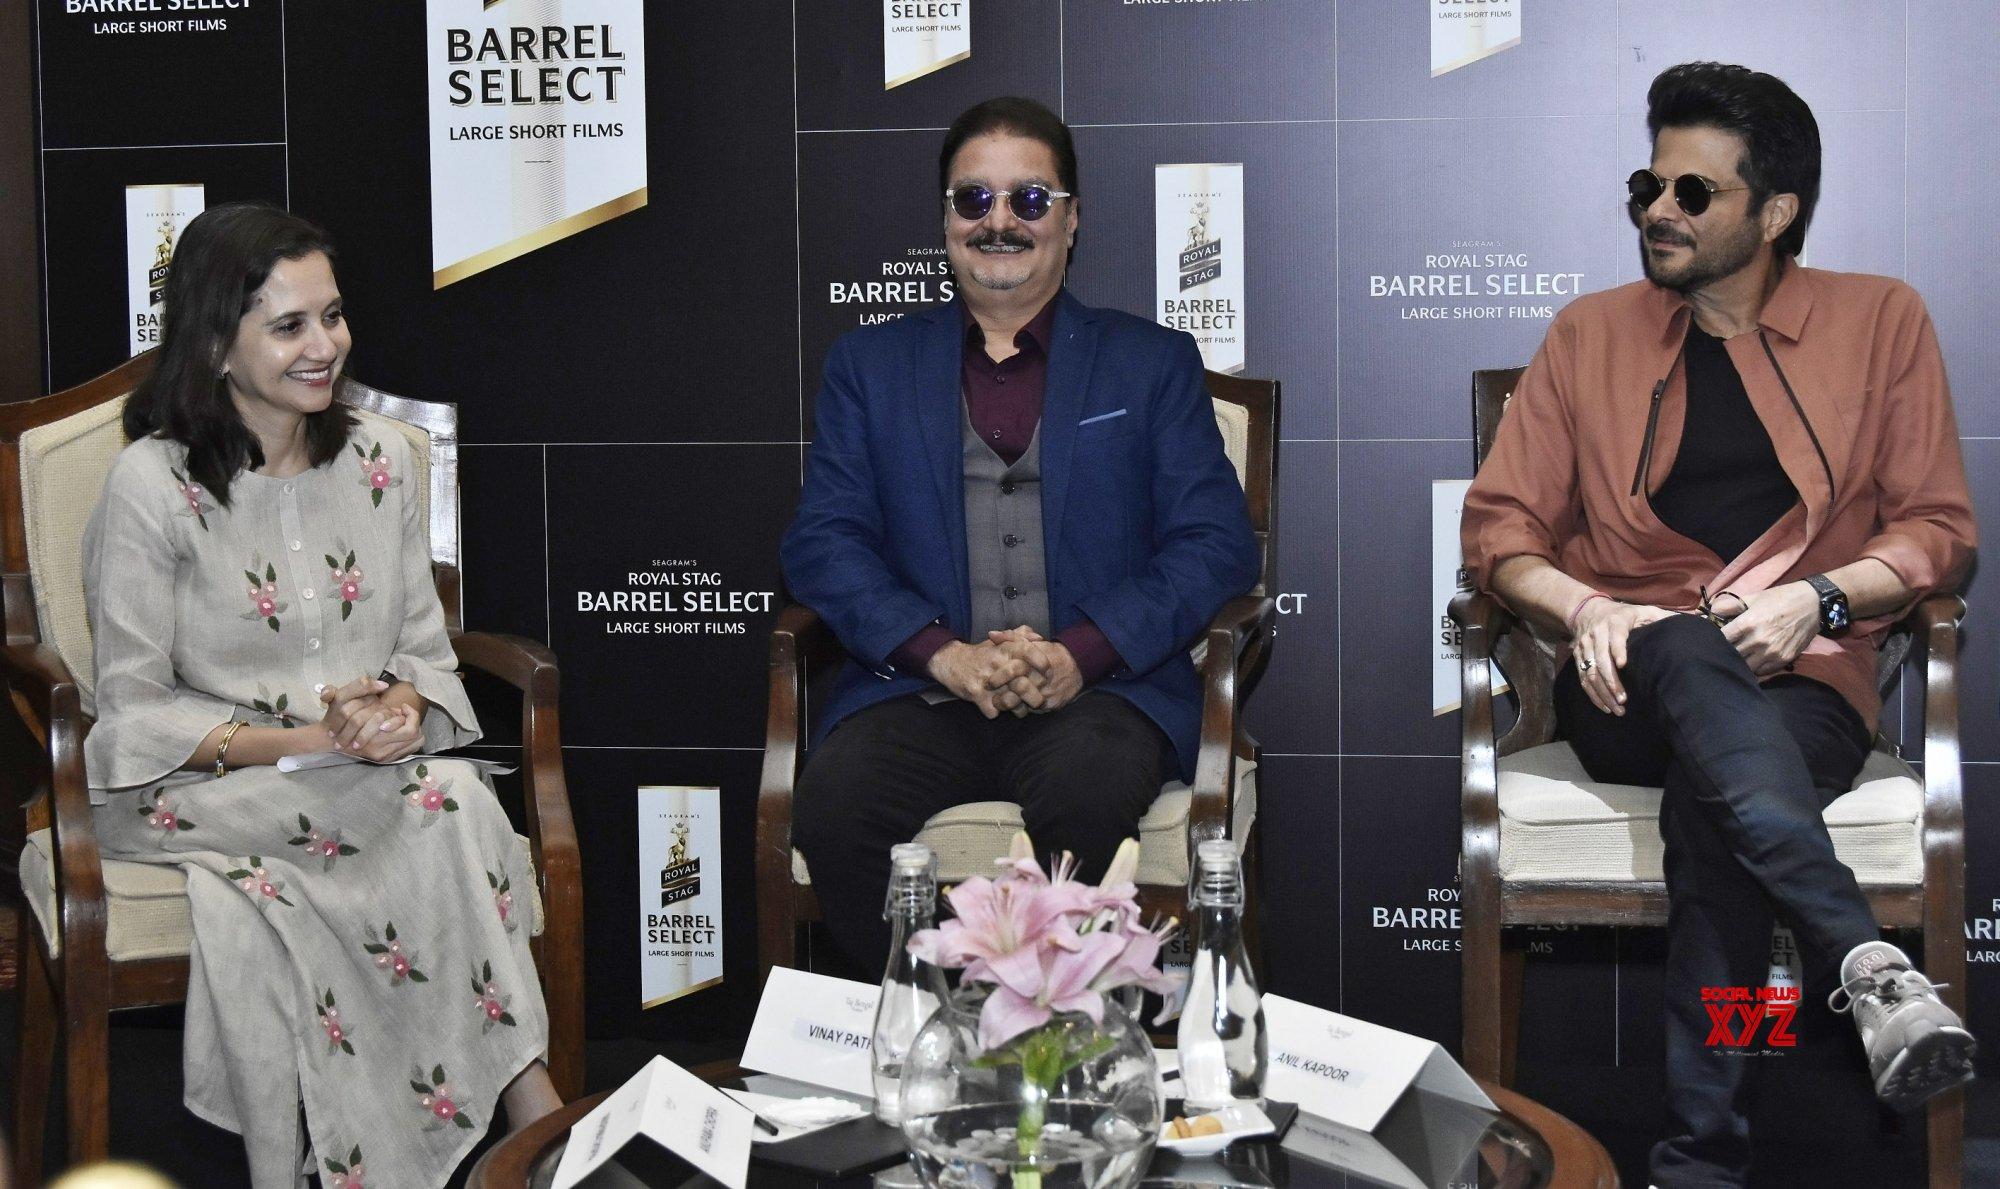 Kolkata: Select Large Short Films - Anil Kapoor, Vinay Pathak #Gallery